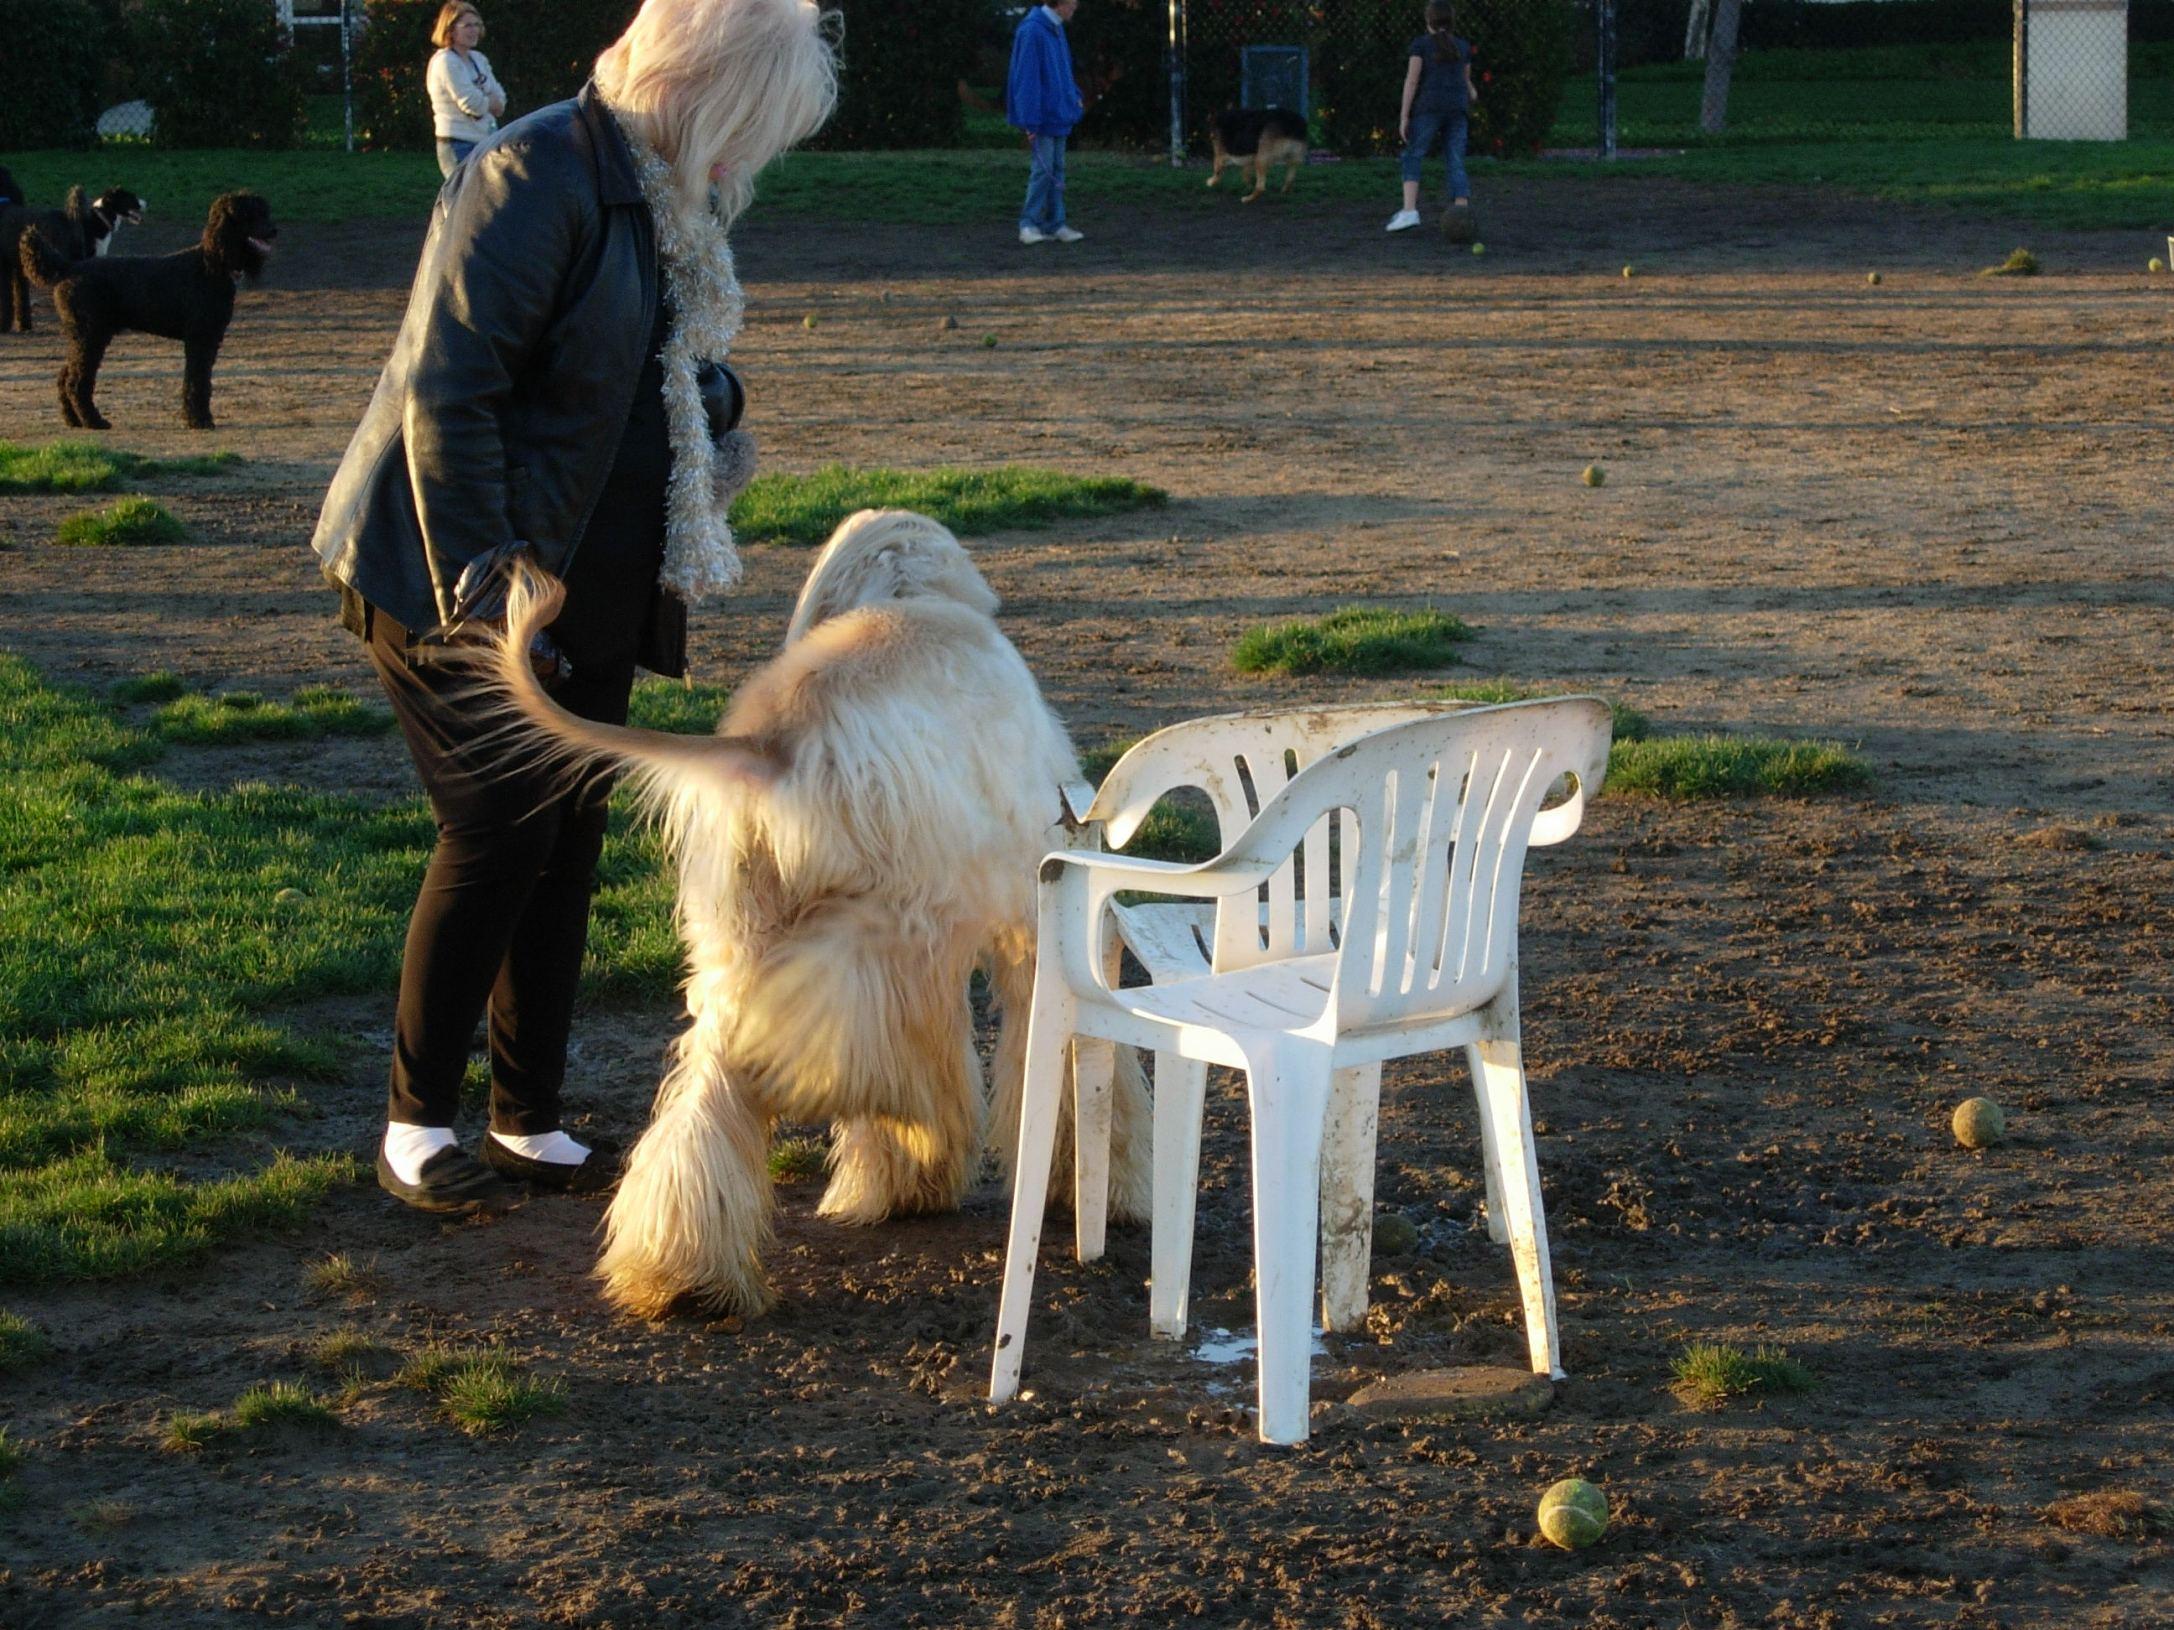 shores-dog-park-014.jpg